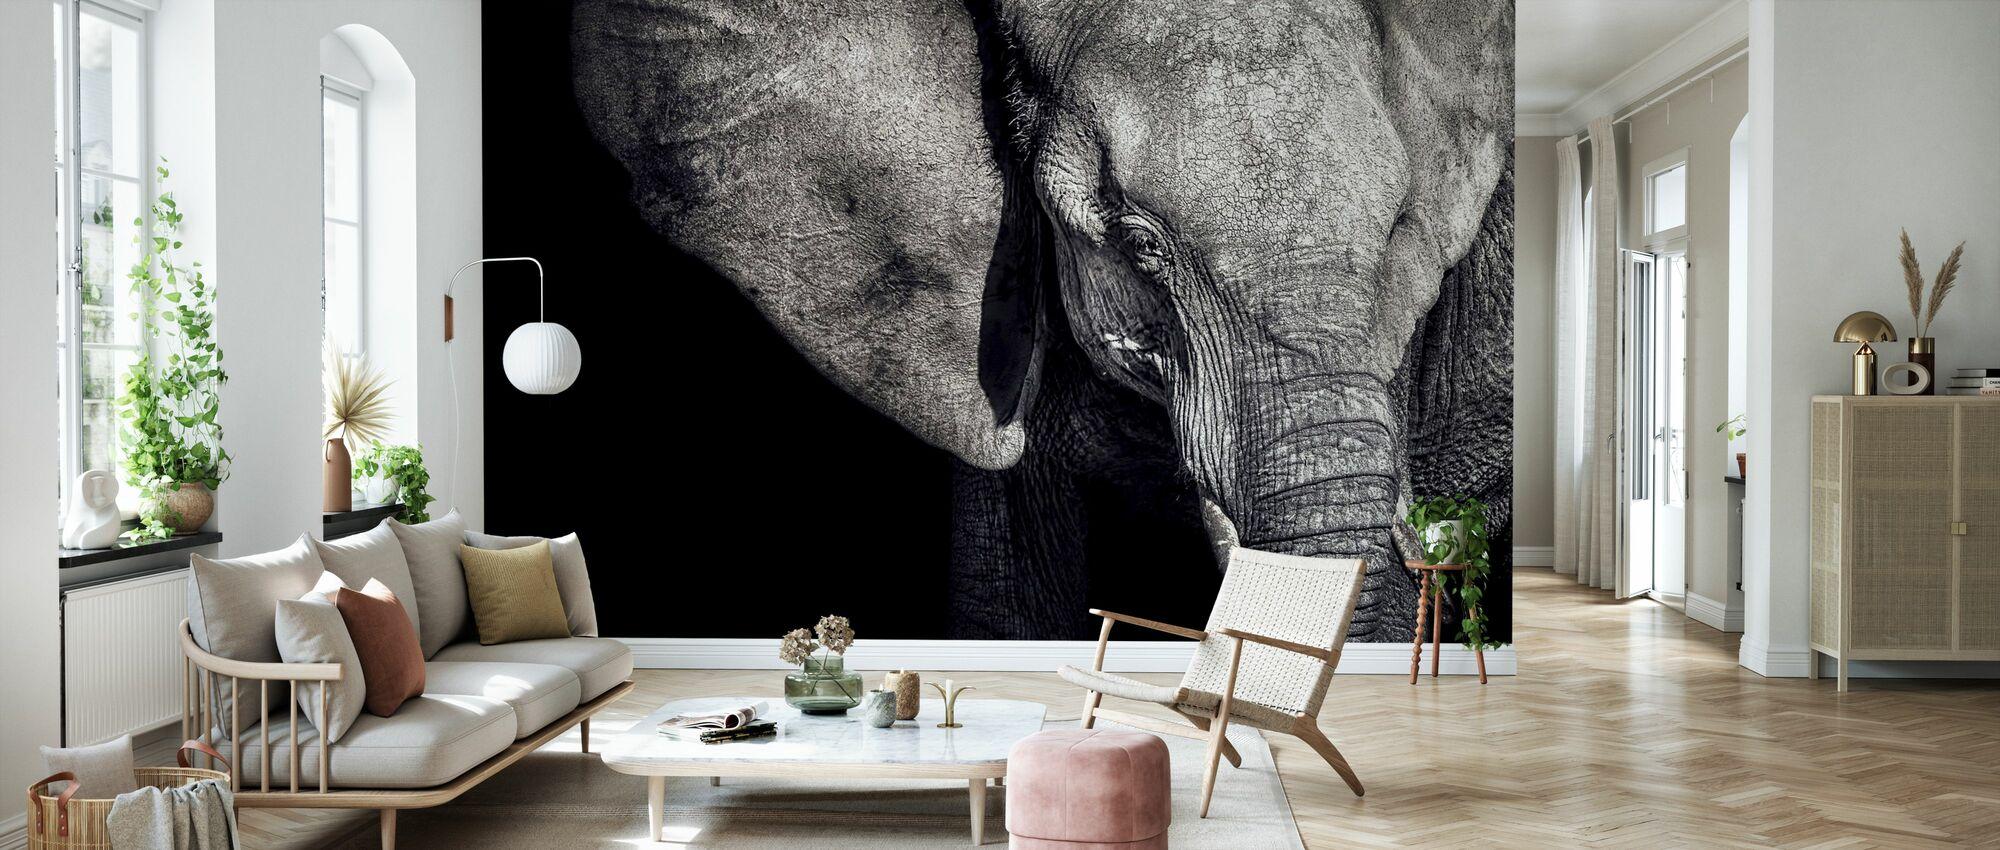 Bellissimo elefante - Carta da parati - Salotto